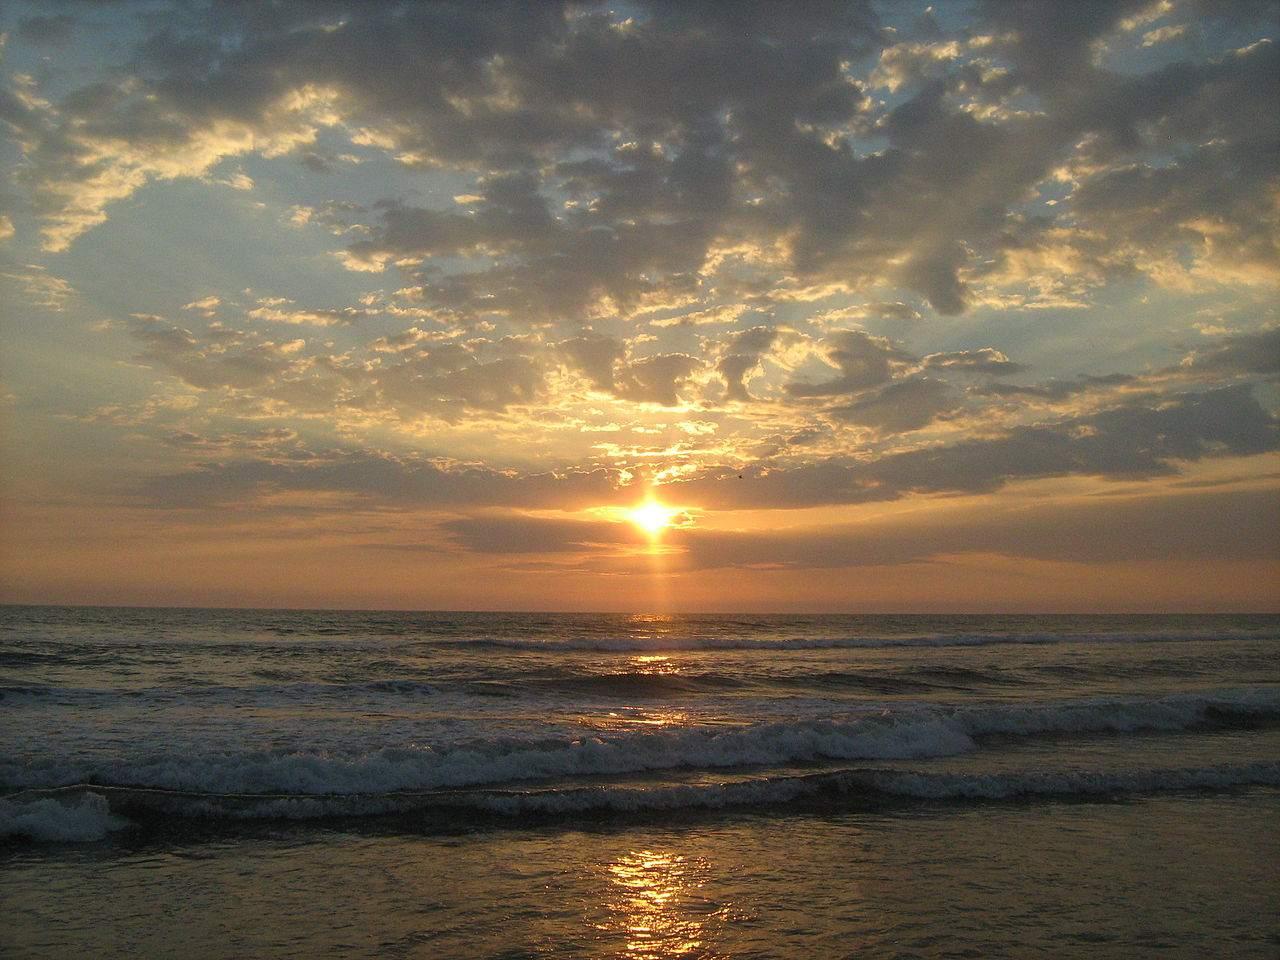 Atardecer en la playa de Tilapa, Ocós, San Marcos